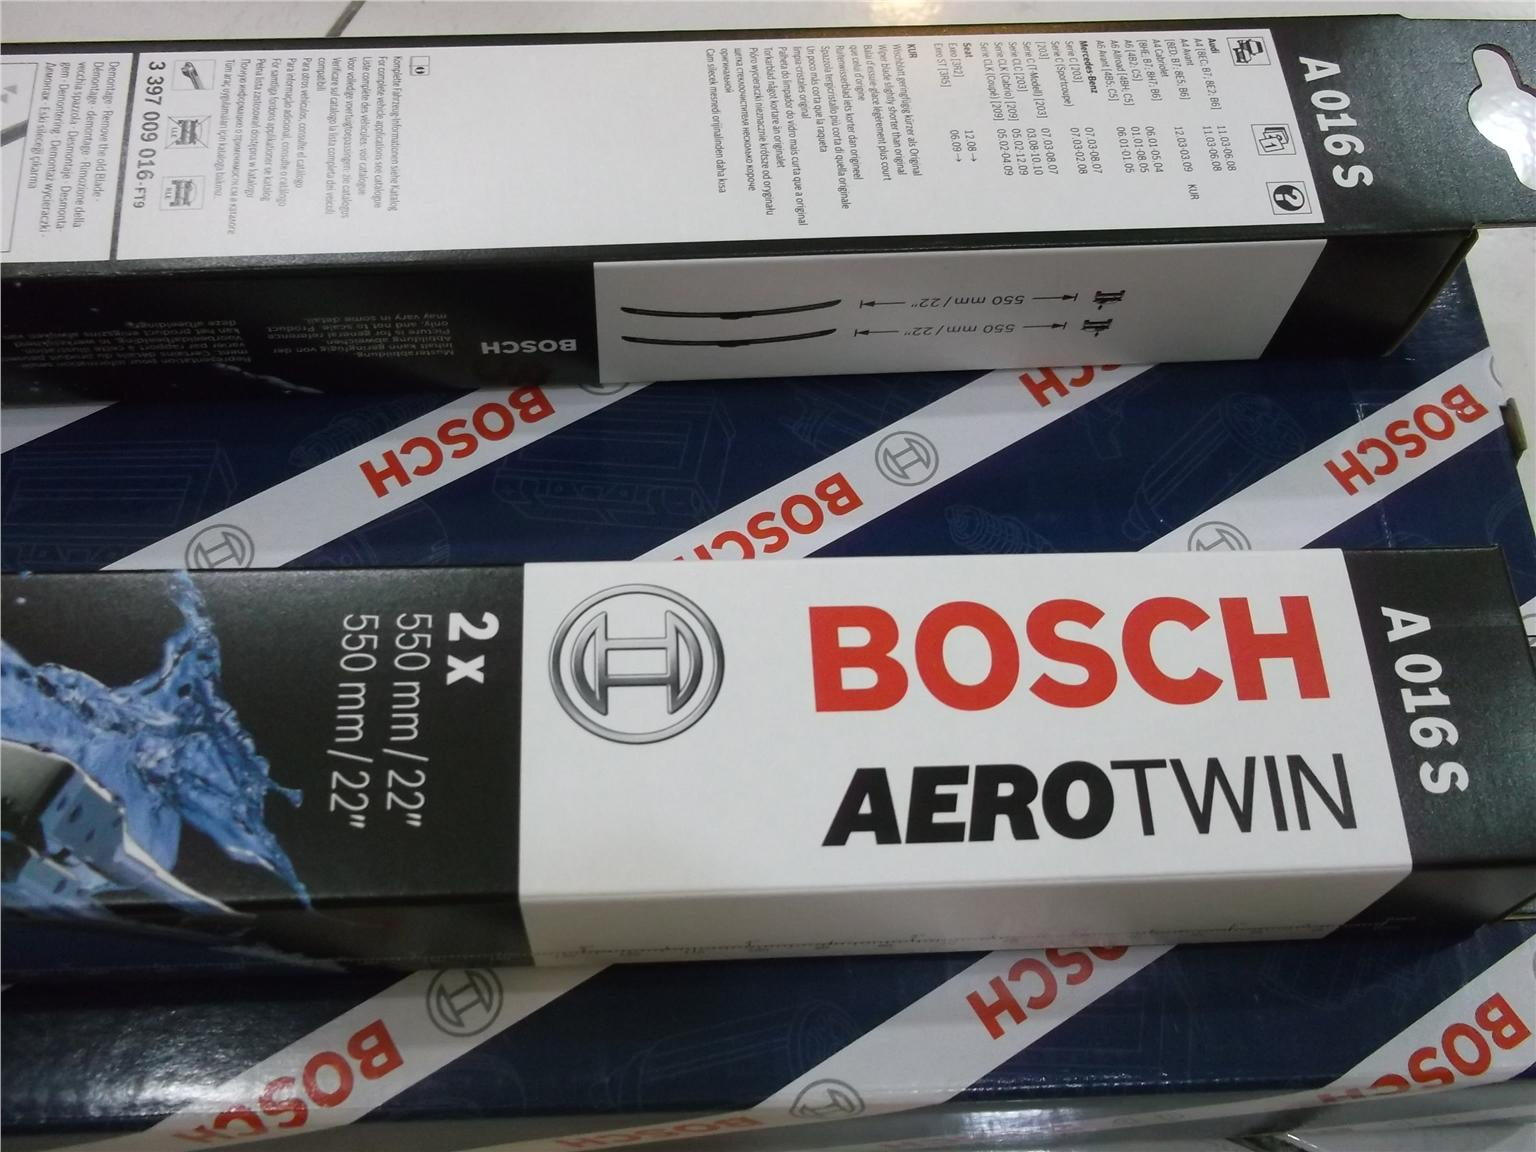 bosch aerotwin wiper blade a016s f end 1 7 2018 12 12 pm. Black Bedroom Furniture Sets. Home Design Ideas